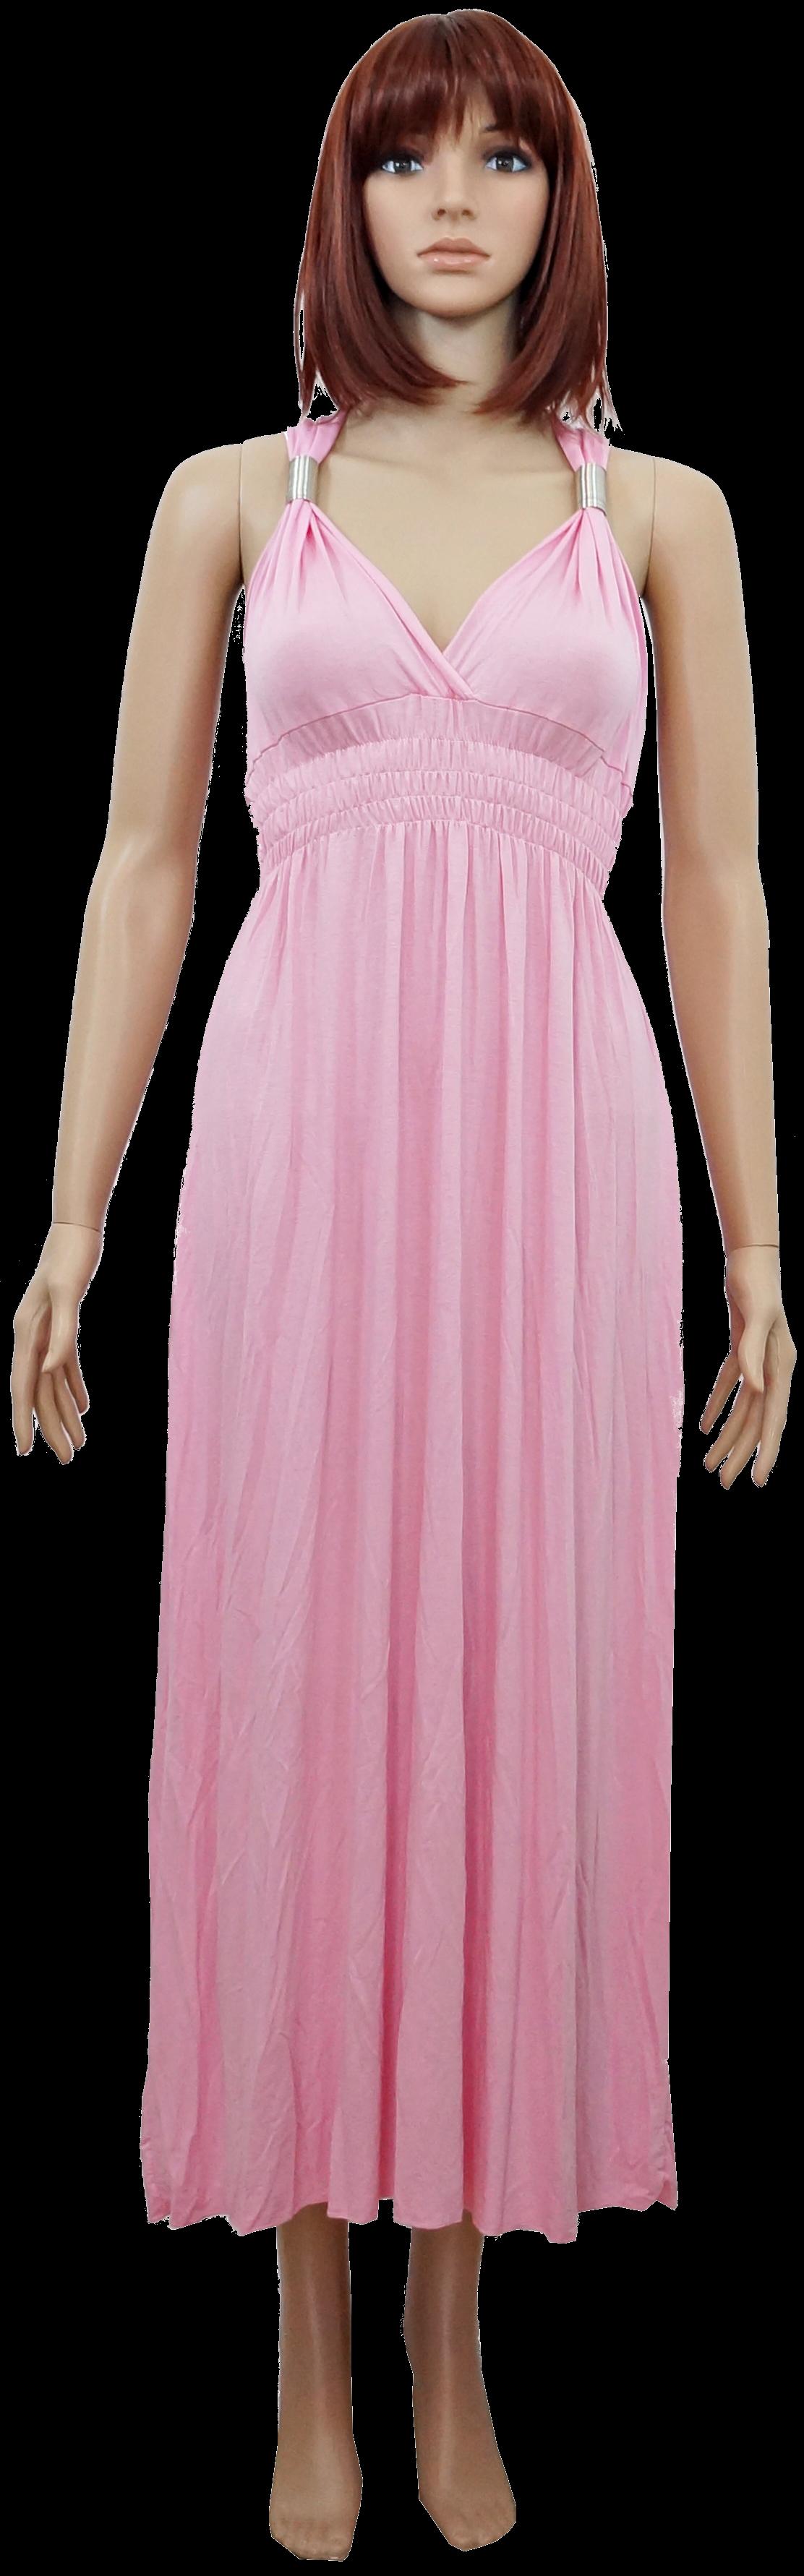 Maxikleid Empirekleid Empire Sommer Strandkleid lang Maxi Kleid XS ...